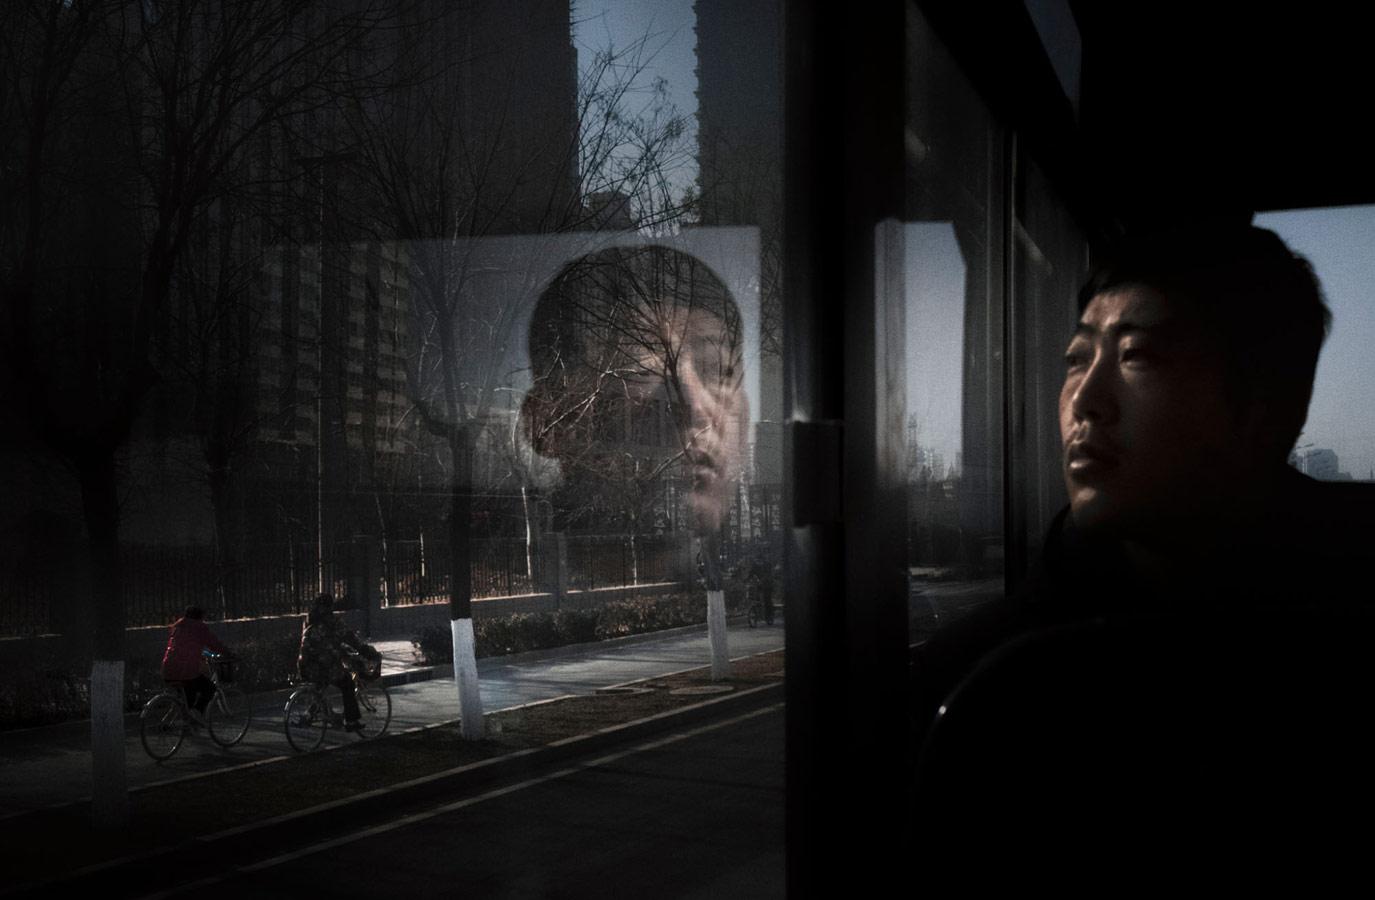 Арек Ратай, Польша / Arek Rataj, Poland, Национальная премия, Фотоконкурс Sony World Photography Awards 2017